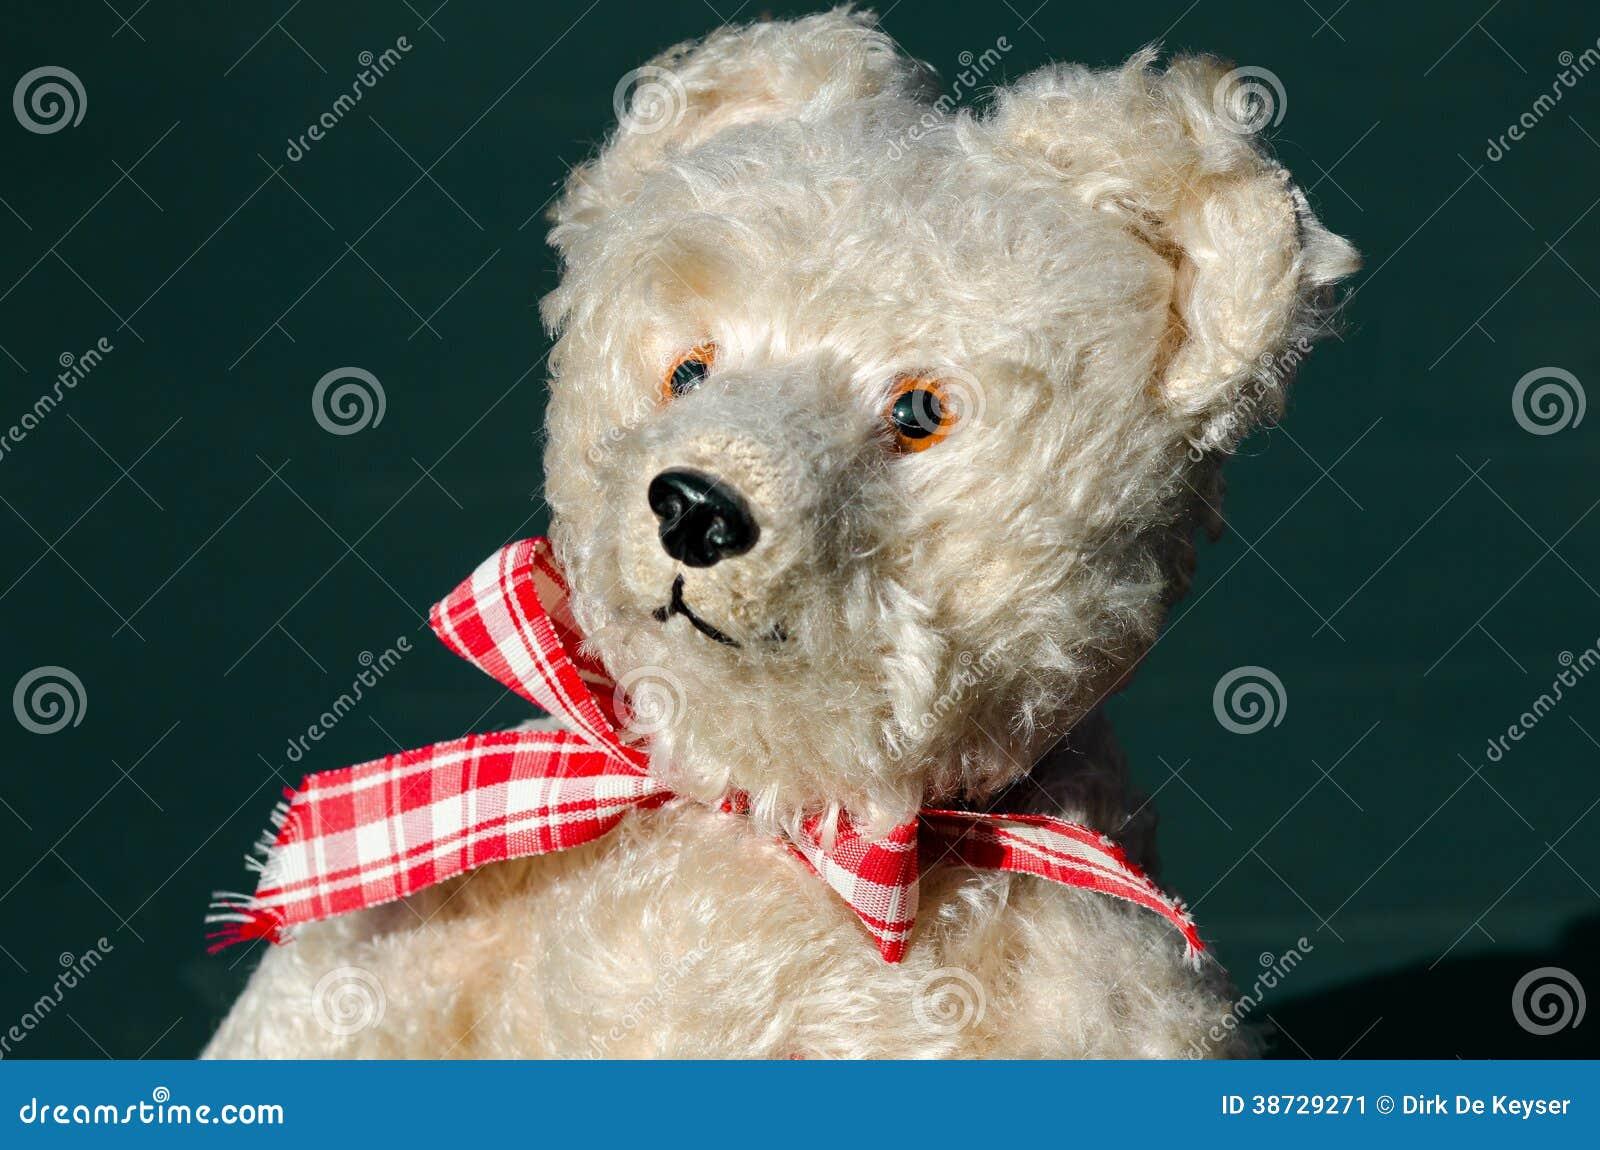 Teddy bear in the sun